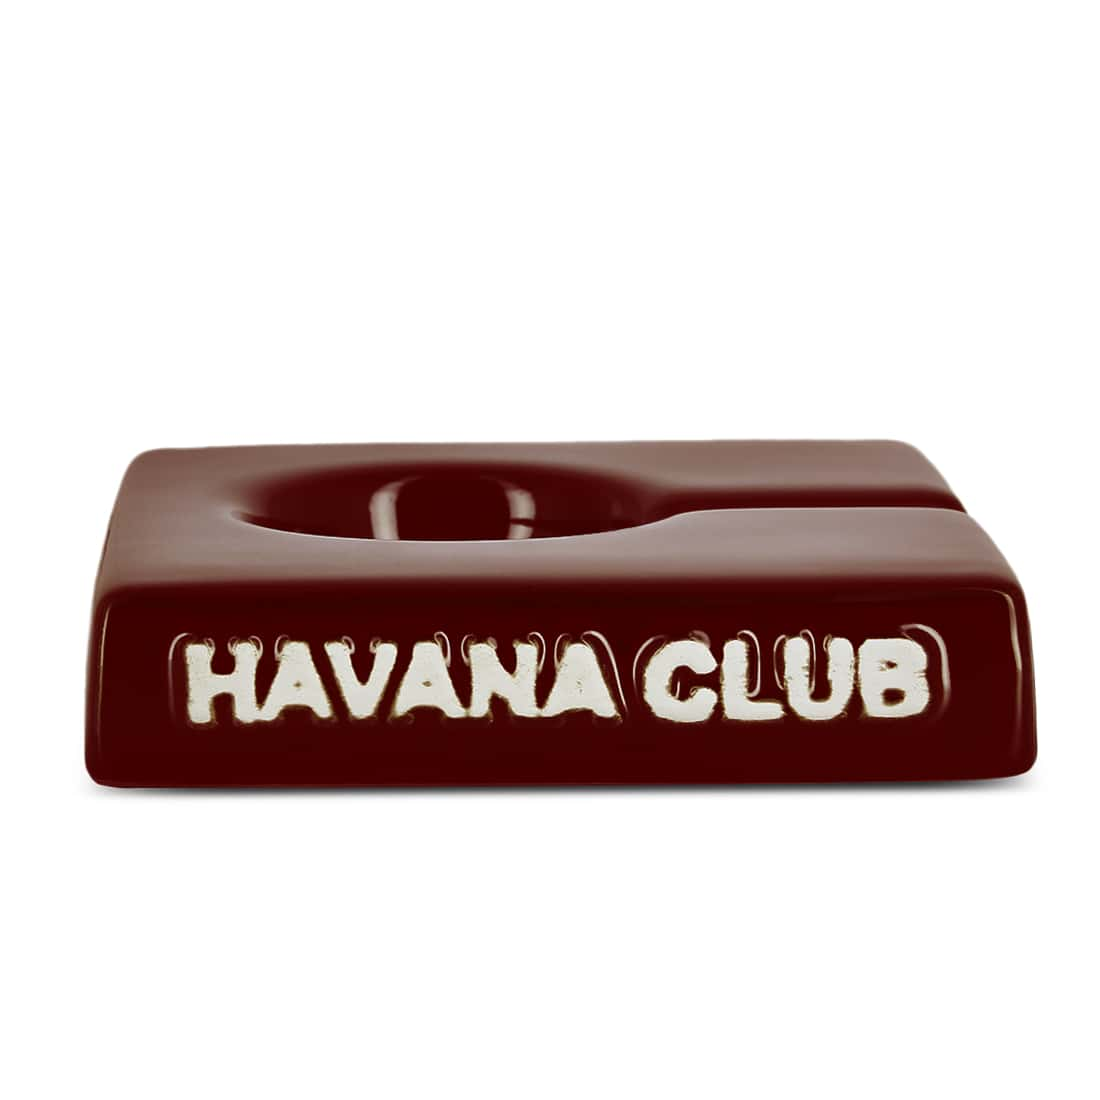 Photo de Cendrier Havana Club Solito Havane